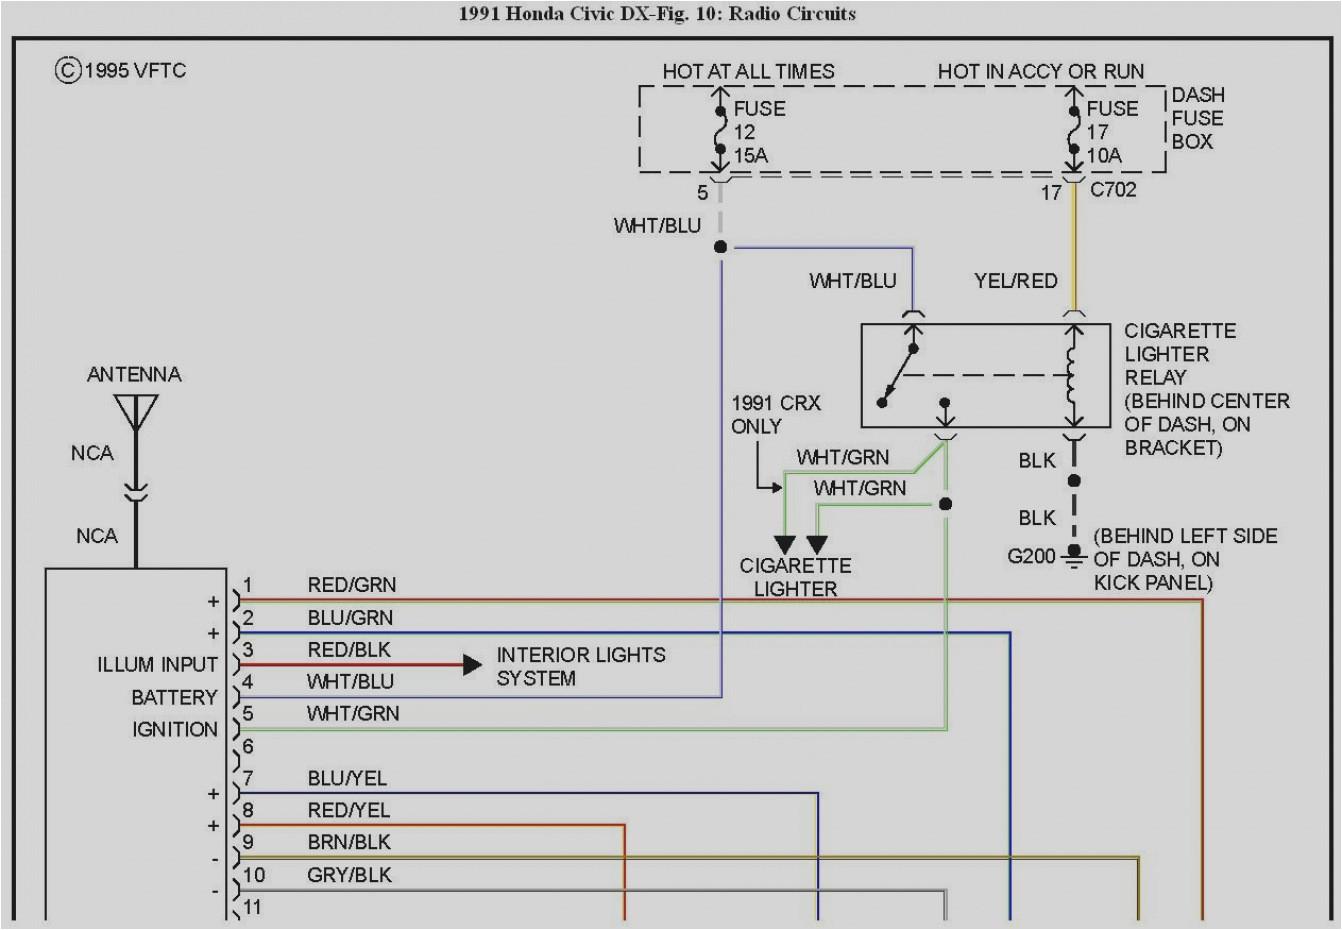 2009 honda civic radio wiring wiring diagram perfomance 2009 honda civic wiring diagram 2009 civic wiring diagram